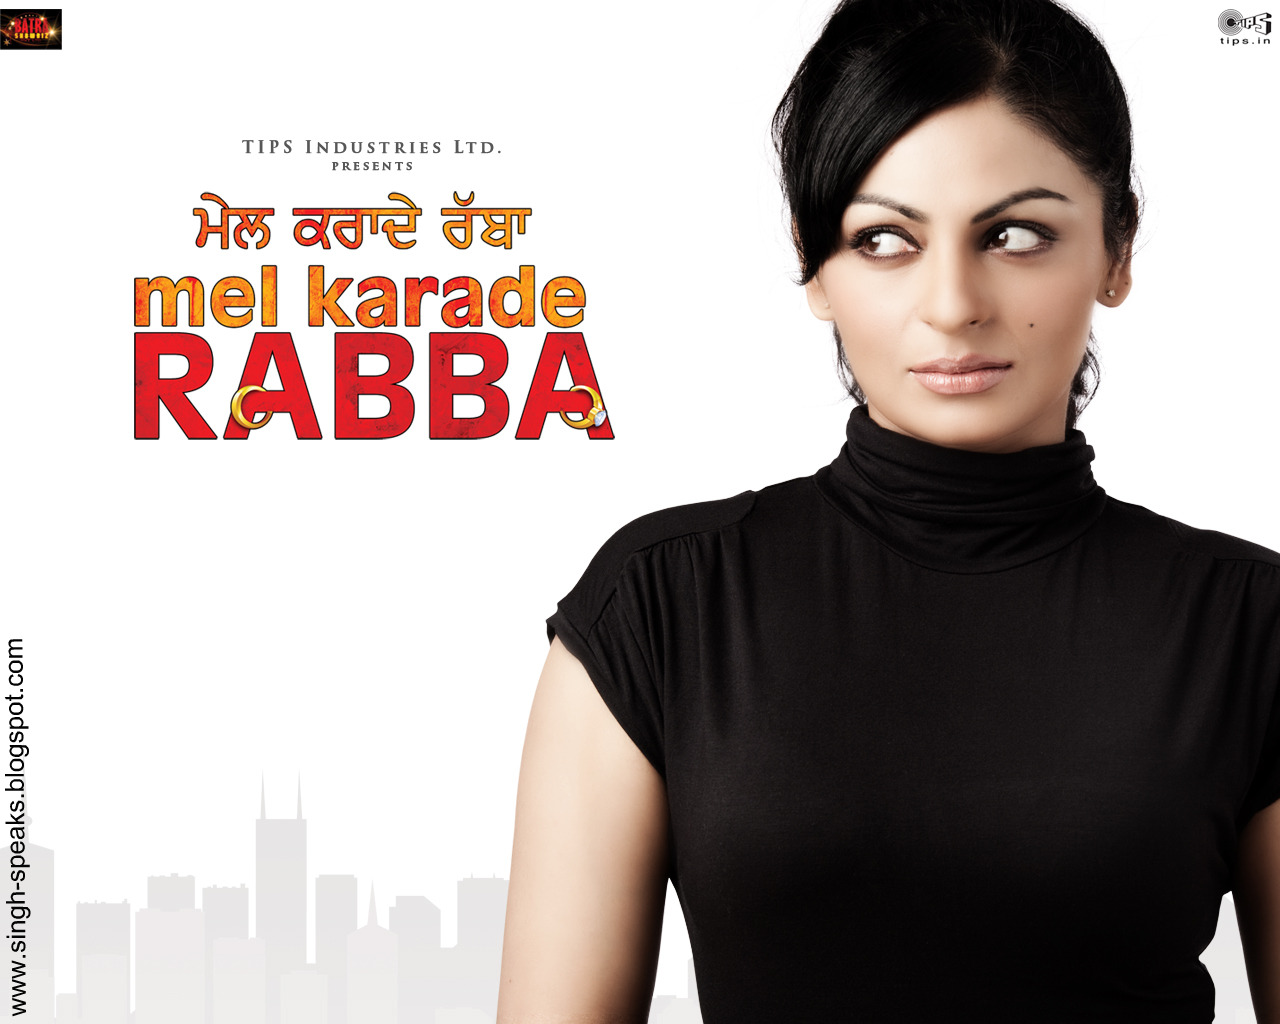 Singh Speaks: Wallpapers - Mel Karade Rabba